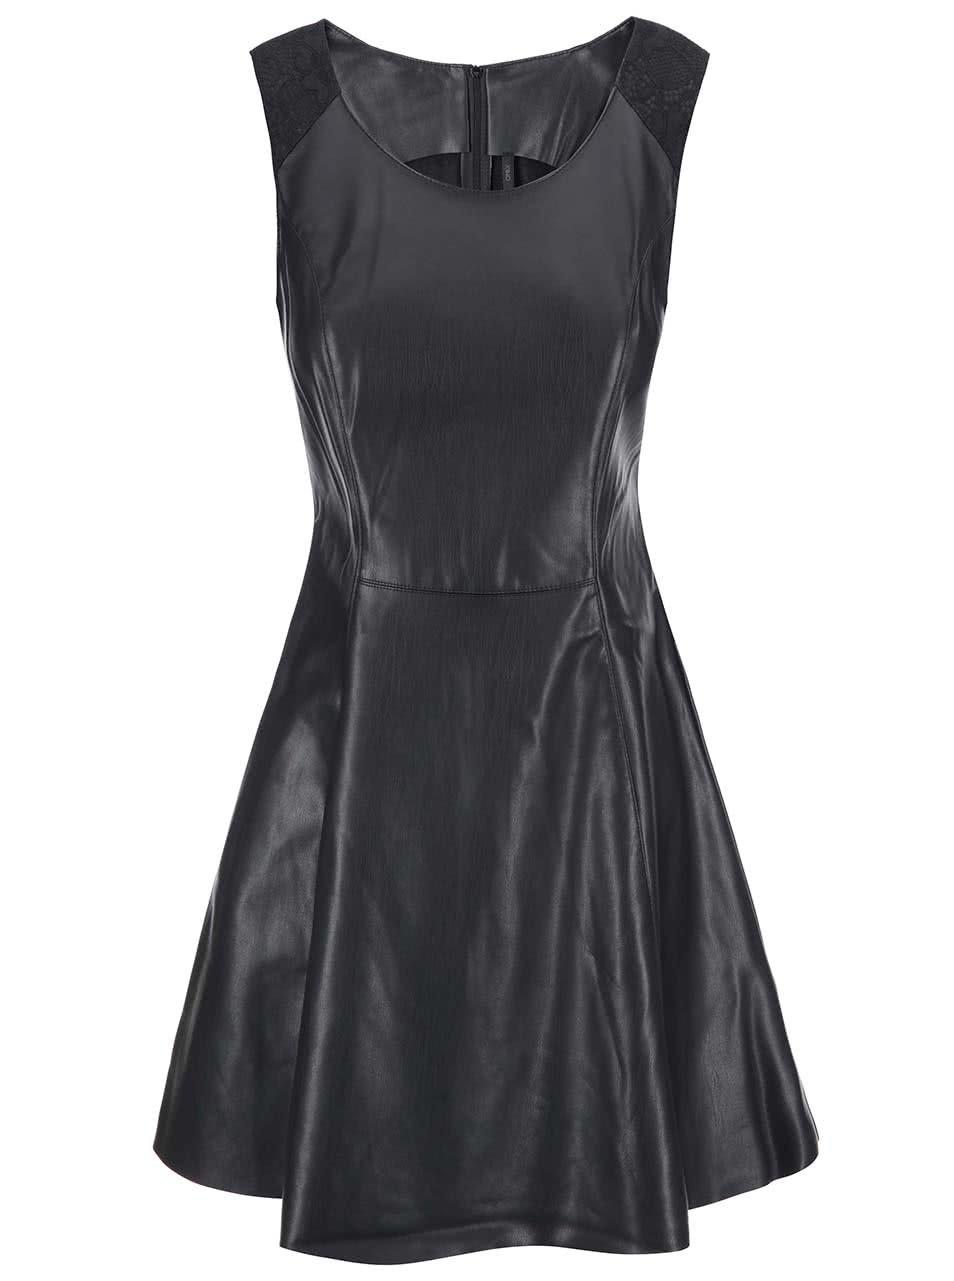 5eec89b70b01 Čierne koženkové šaty ONLY Flower ...